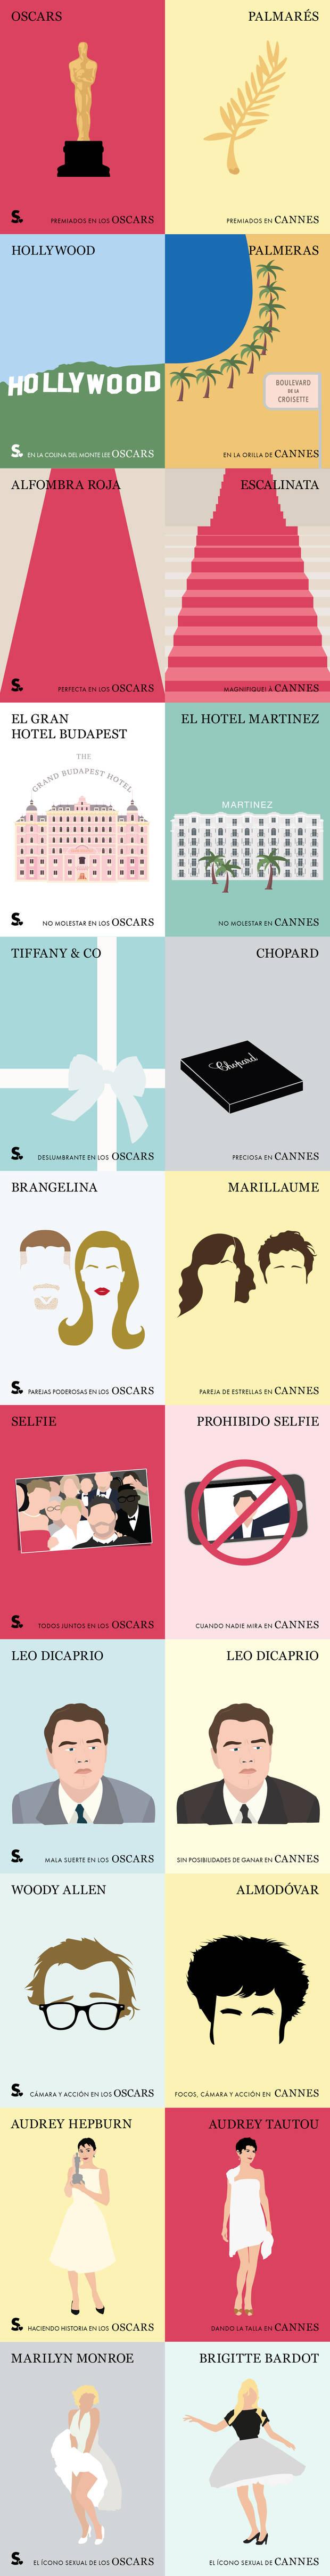 2015_CannesVSoscar_web_ES_infographic1